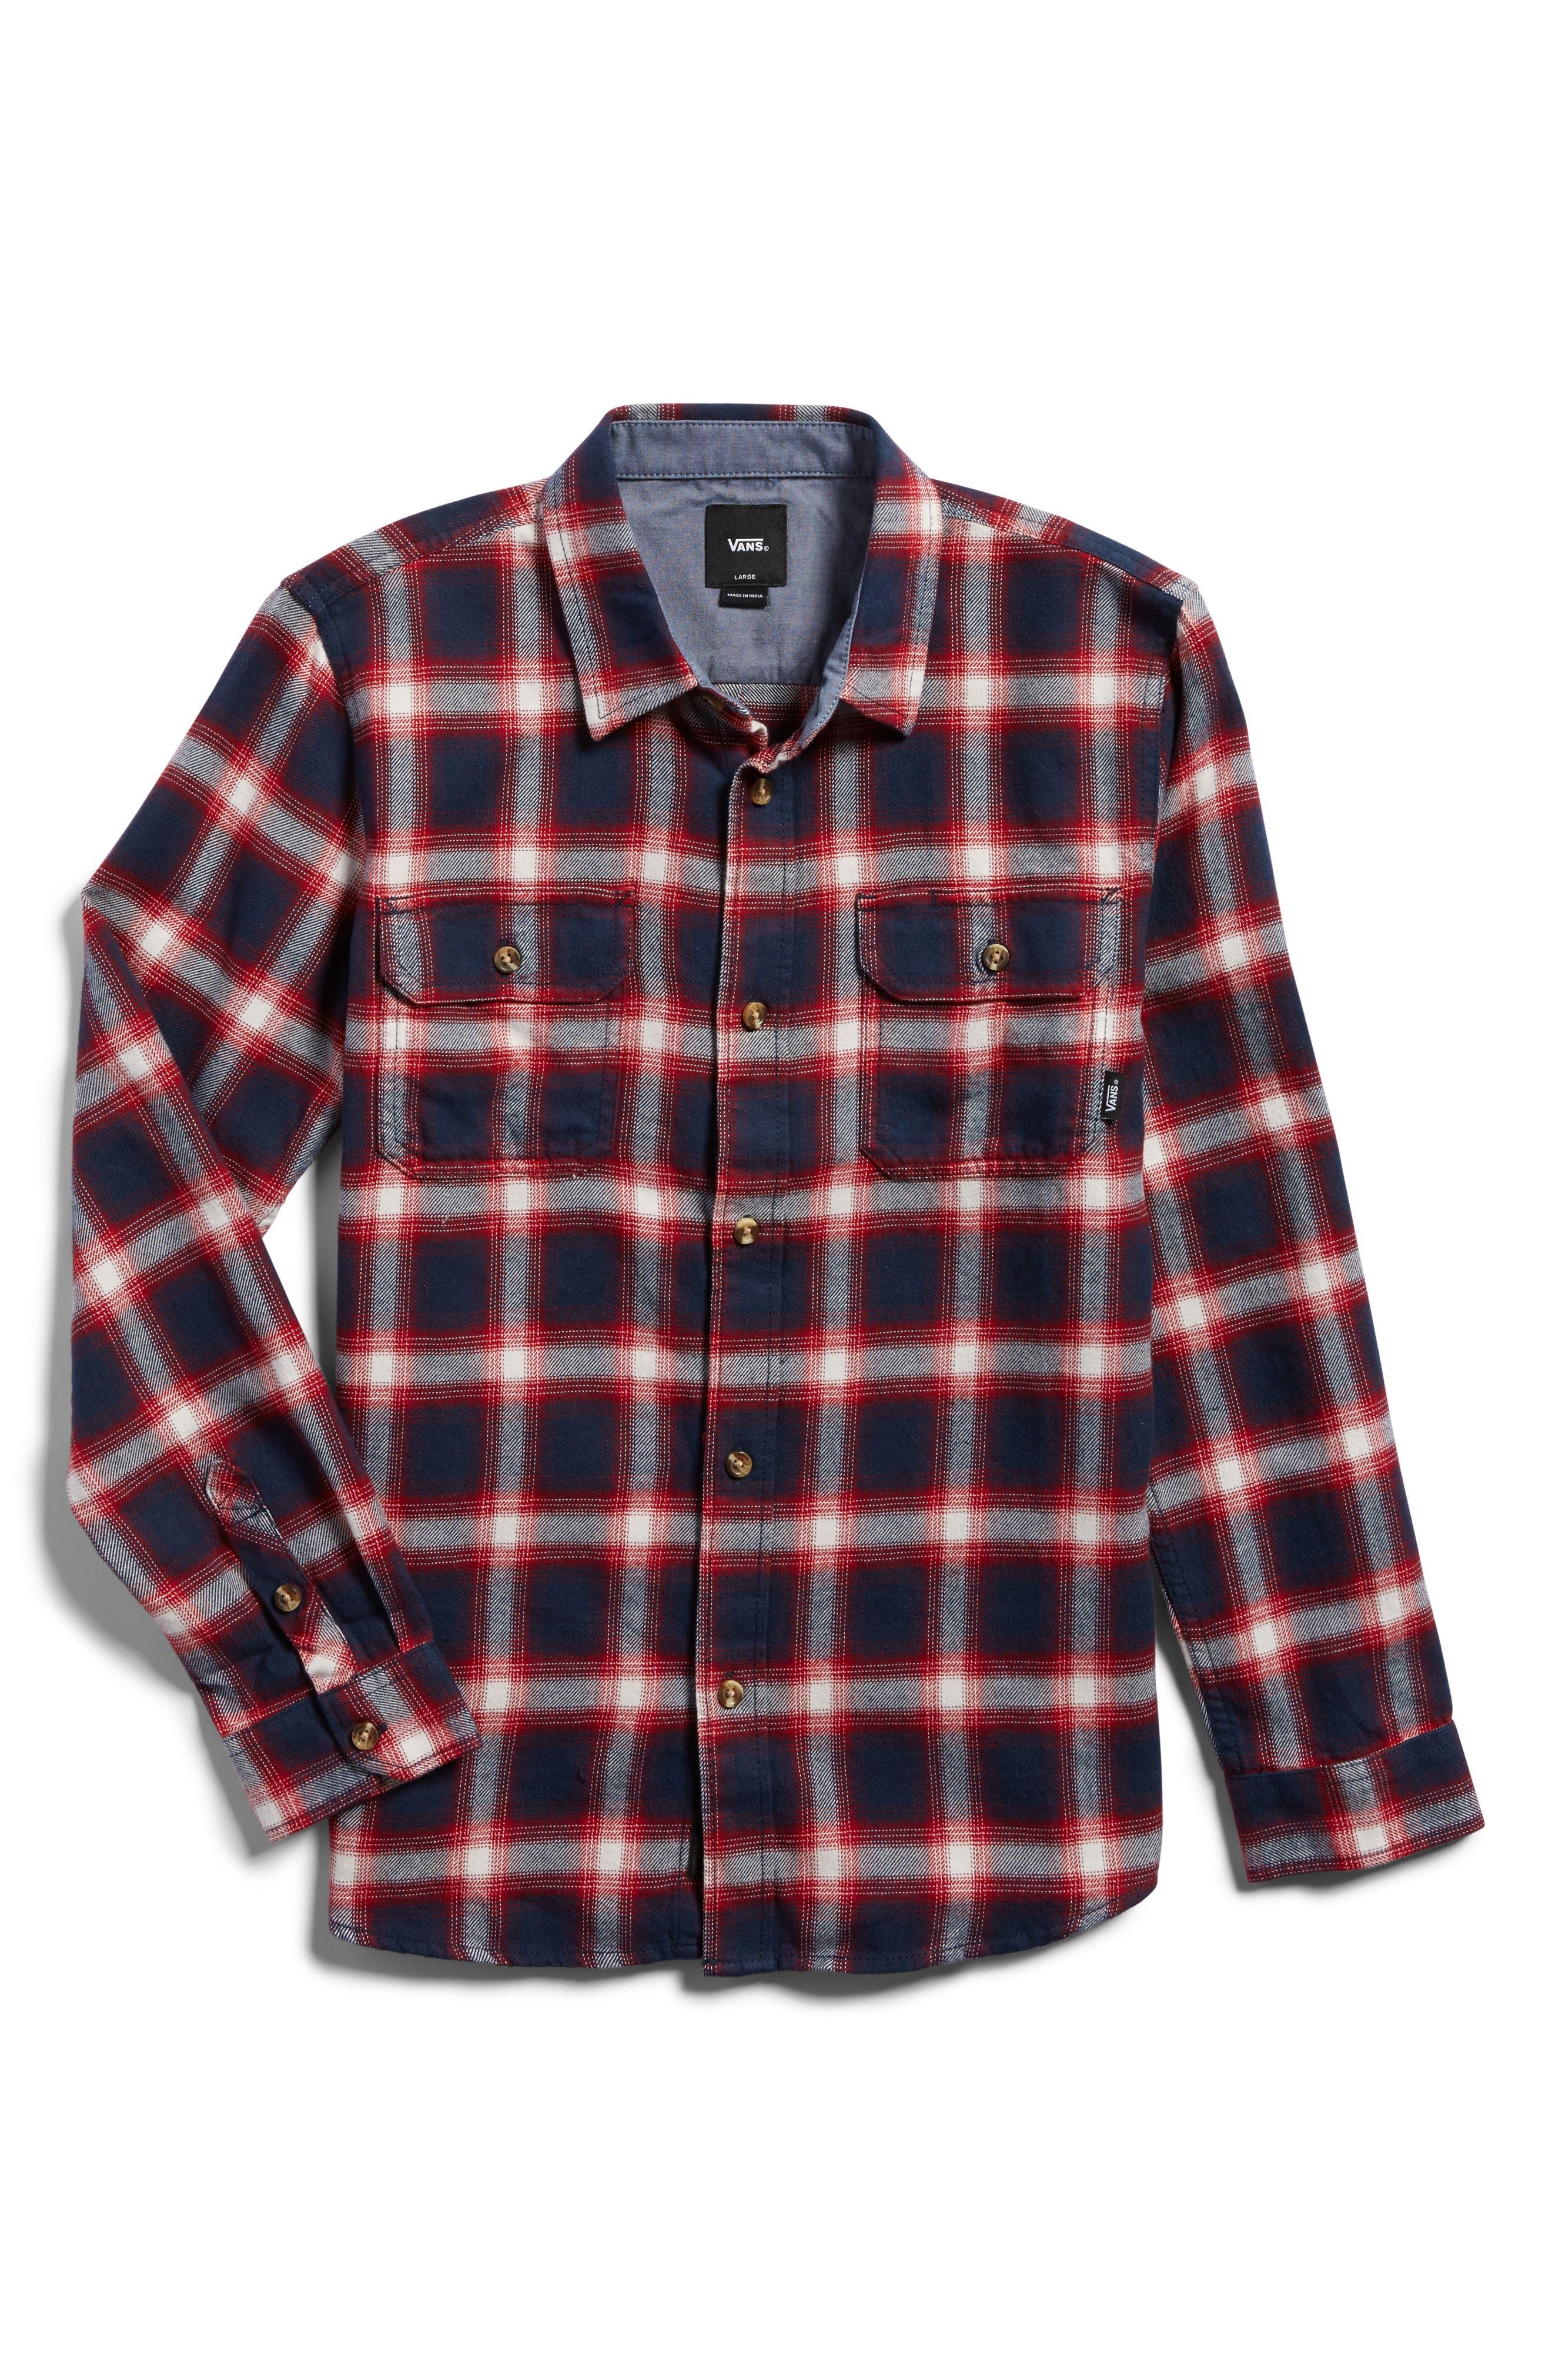 Beechwood Plaid Flannel Shirt,                         Main,                         color, Dress Blues/ Chili Pepper